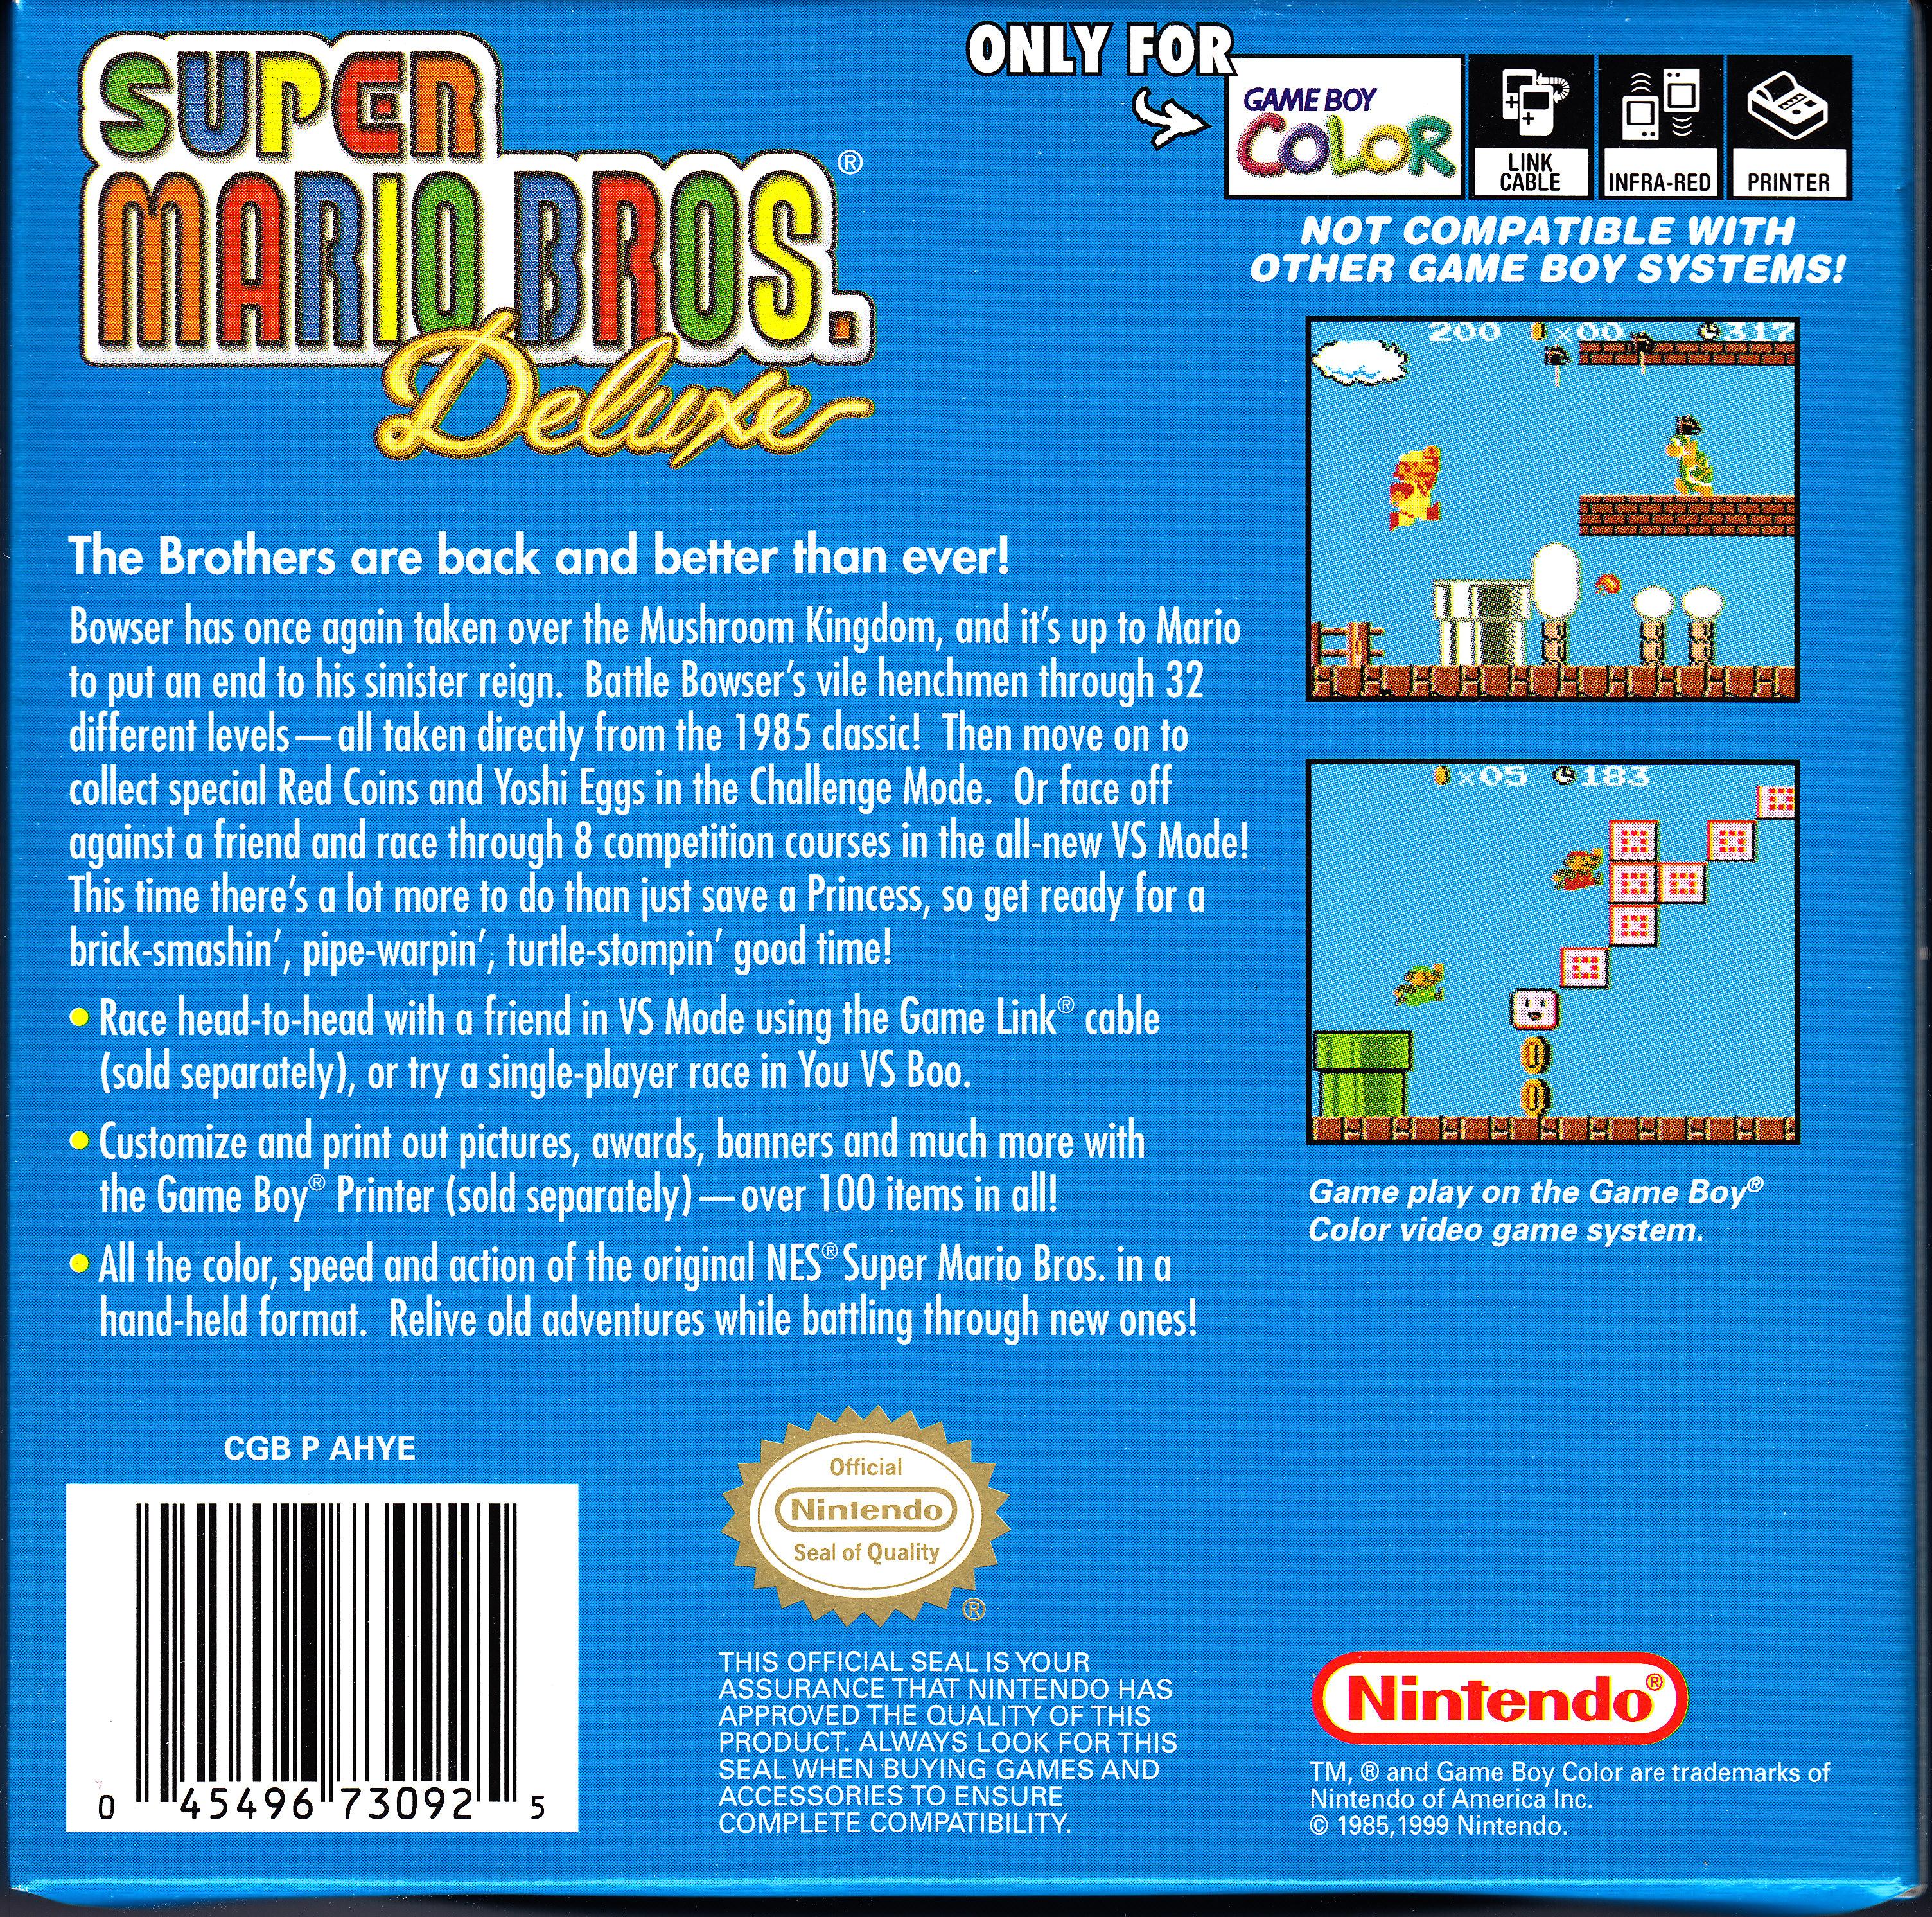 Game boy color super mario bros deluxe -  Game Boy Color Super Mario Bros Deluxe Back Cover Jpg